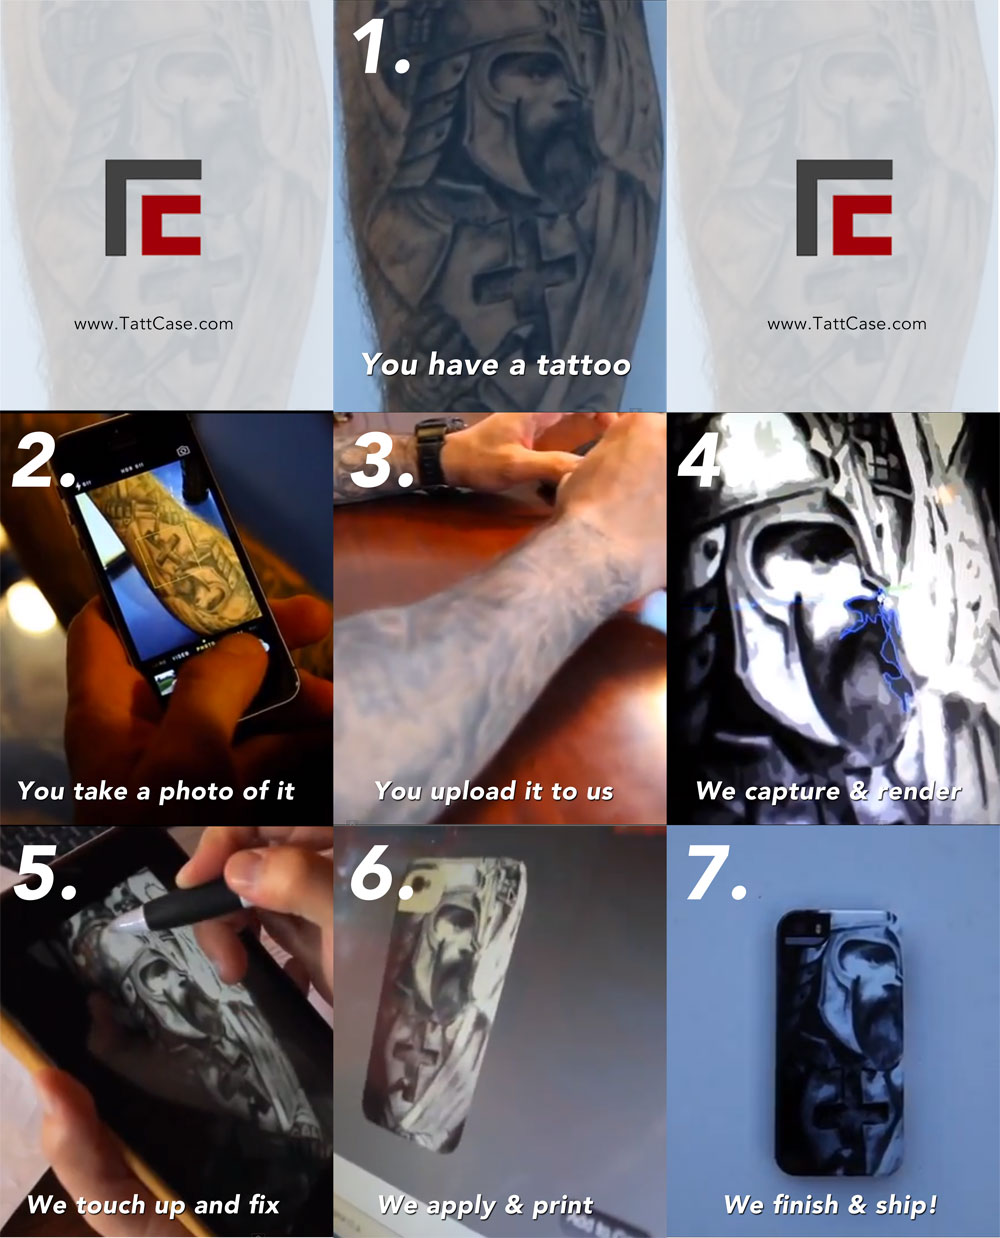 tattcase-infographic